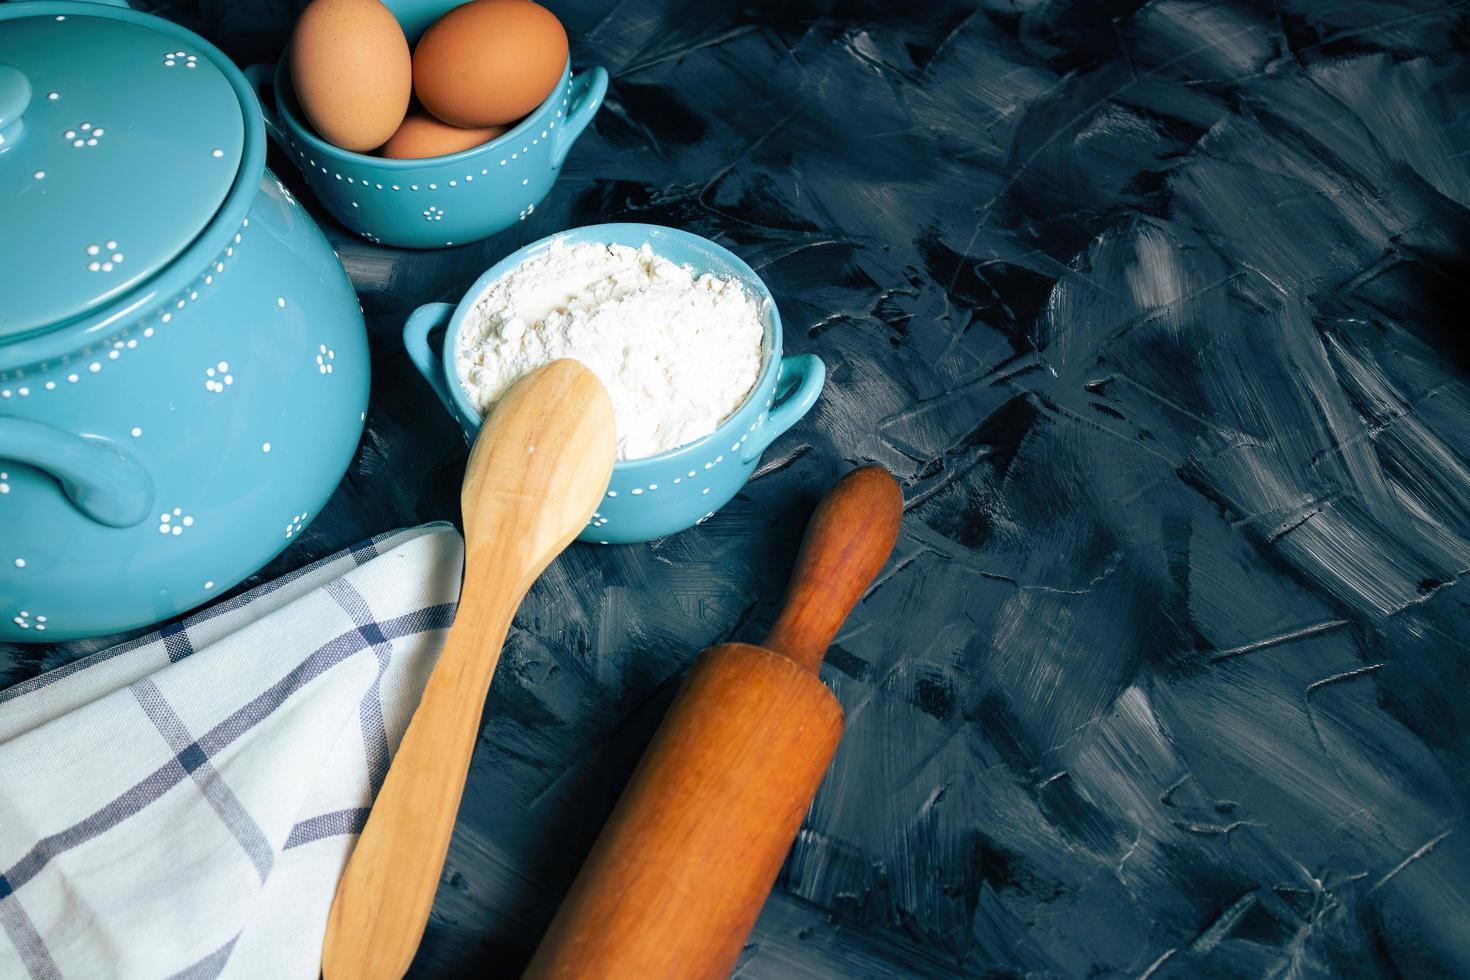 bakningingredienser på en grå bakgrund foto